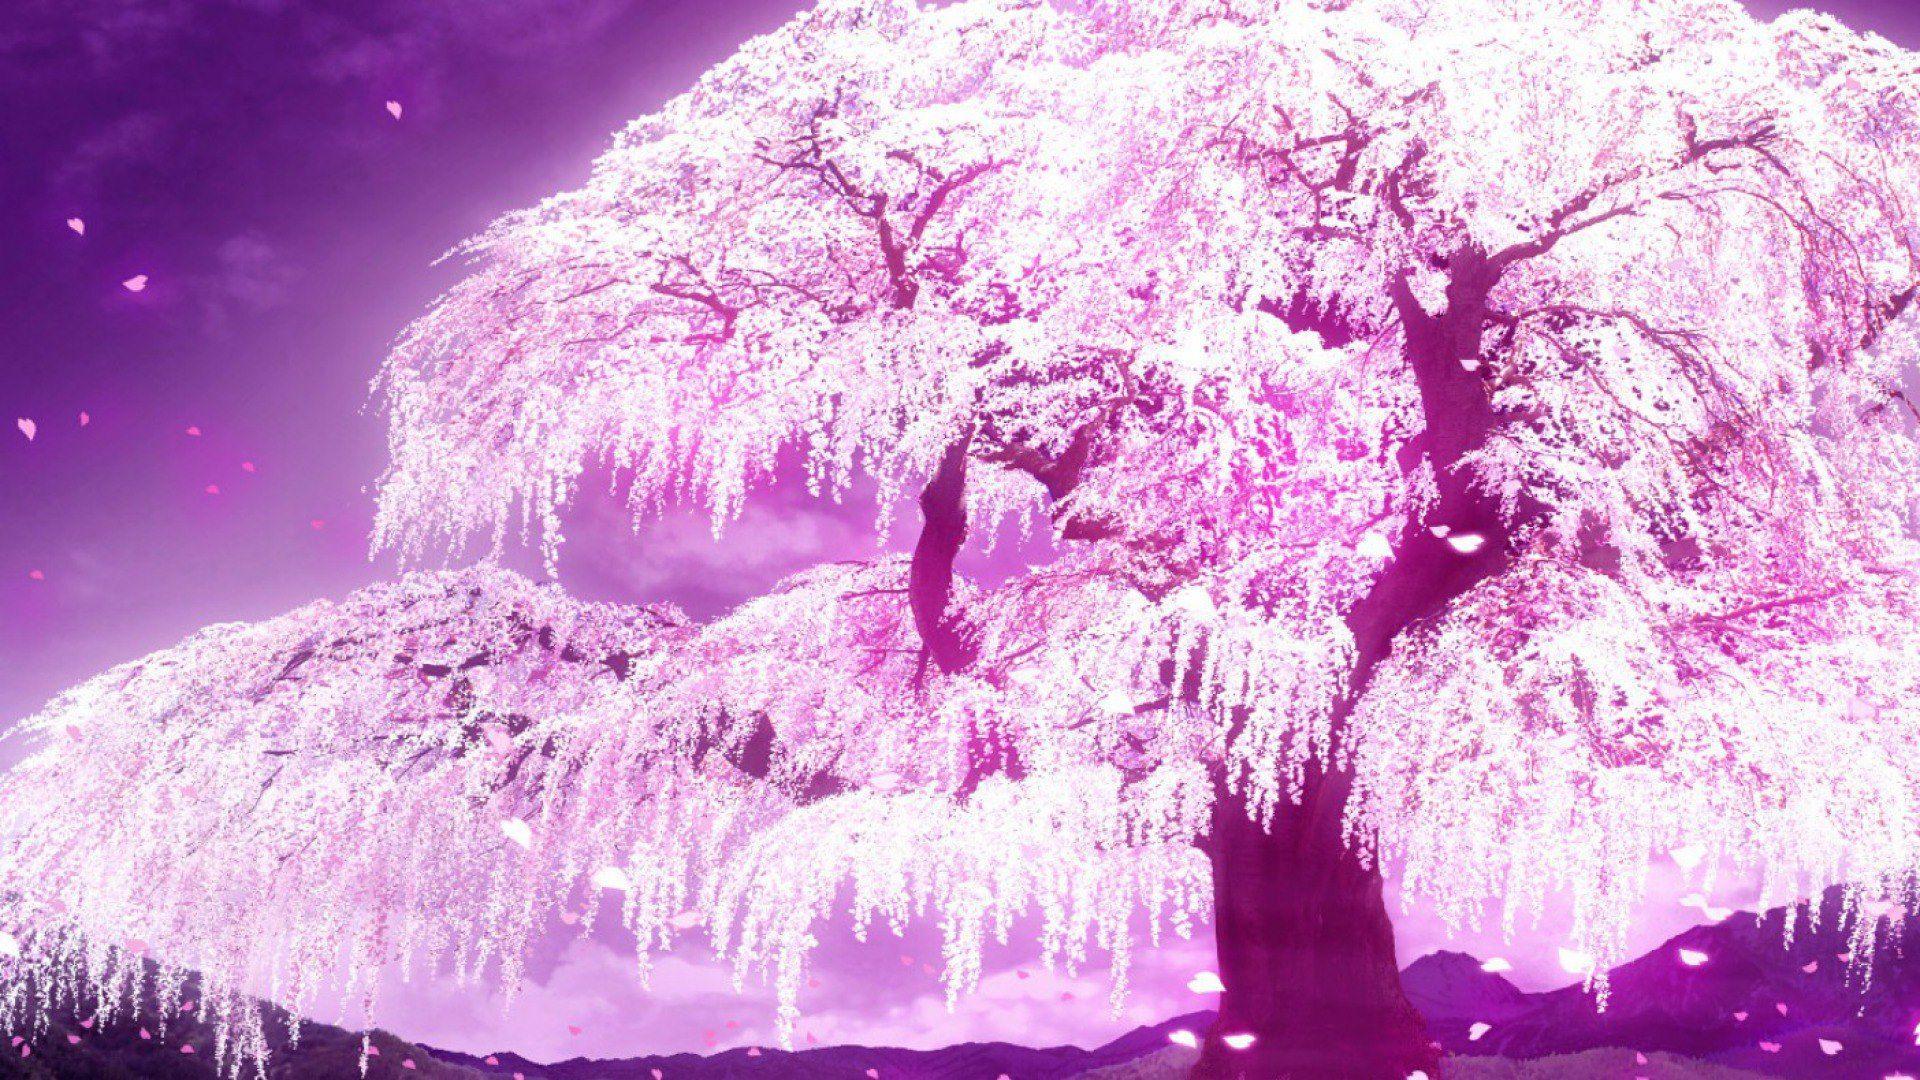 Download Wallpaper Night Cherry Blossom - 627fe1357c8a986edb06f5ed34b93f54  Trends.jpg